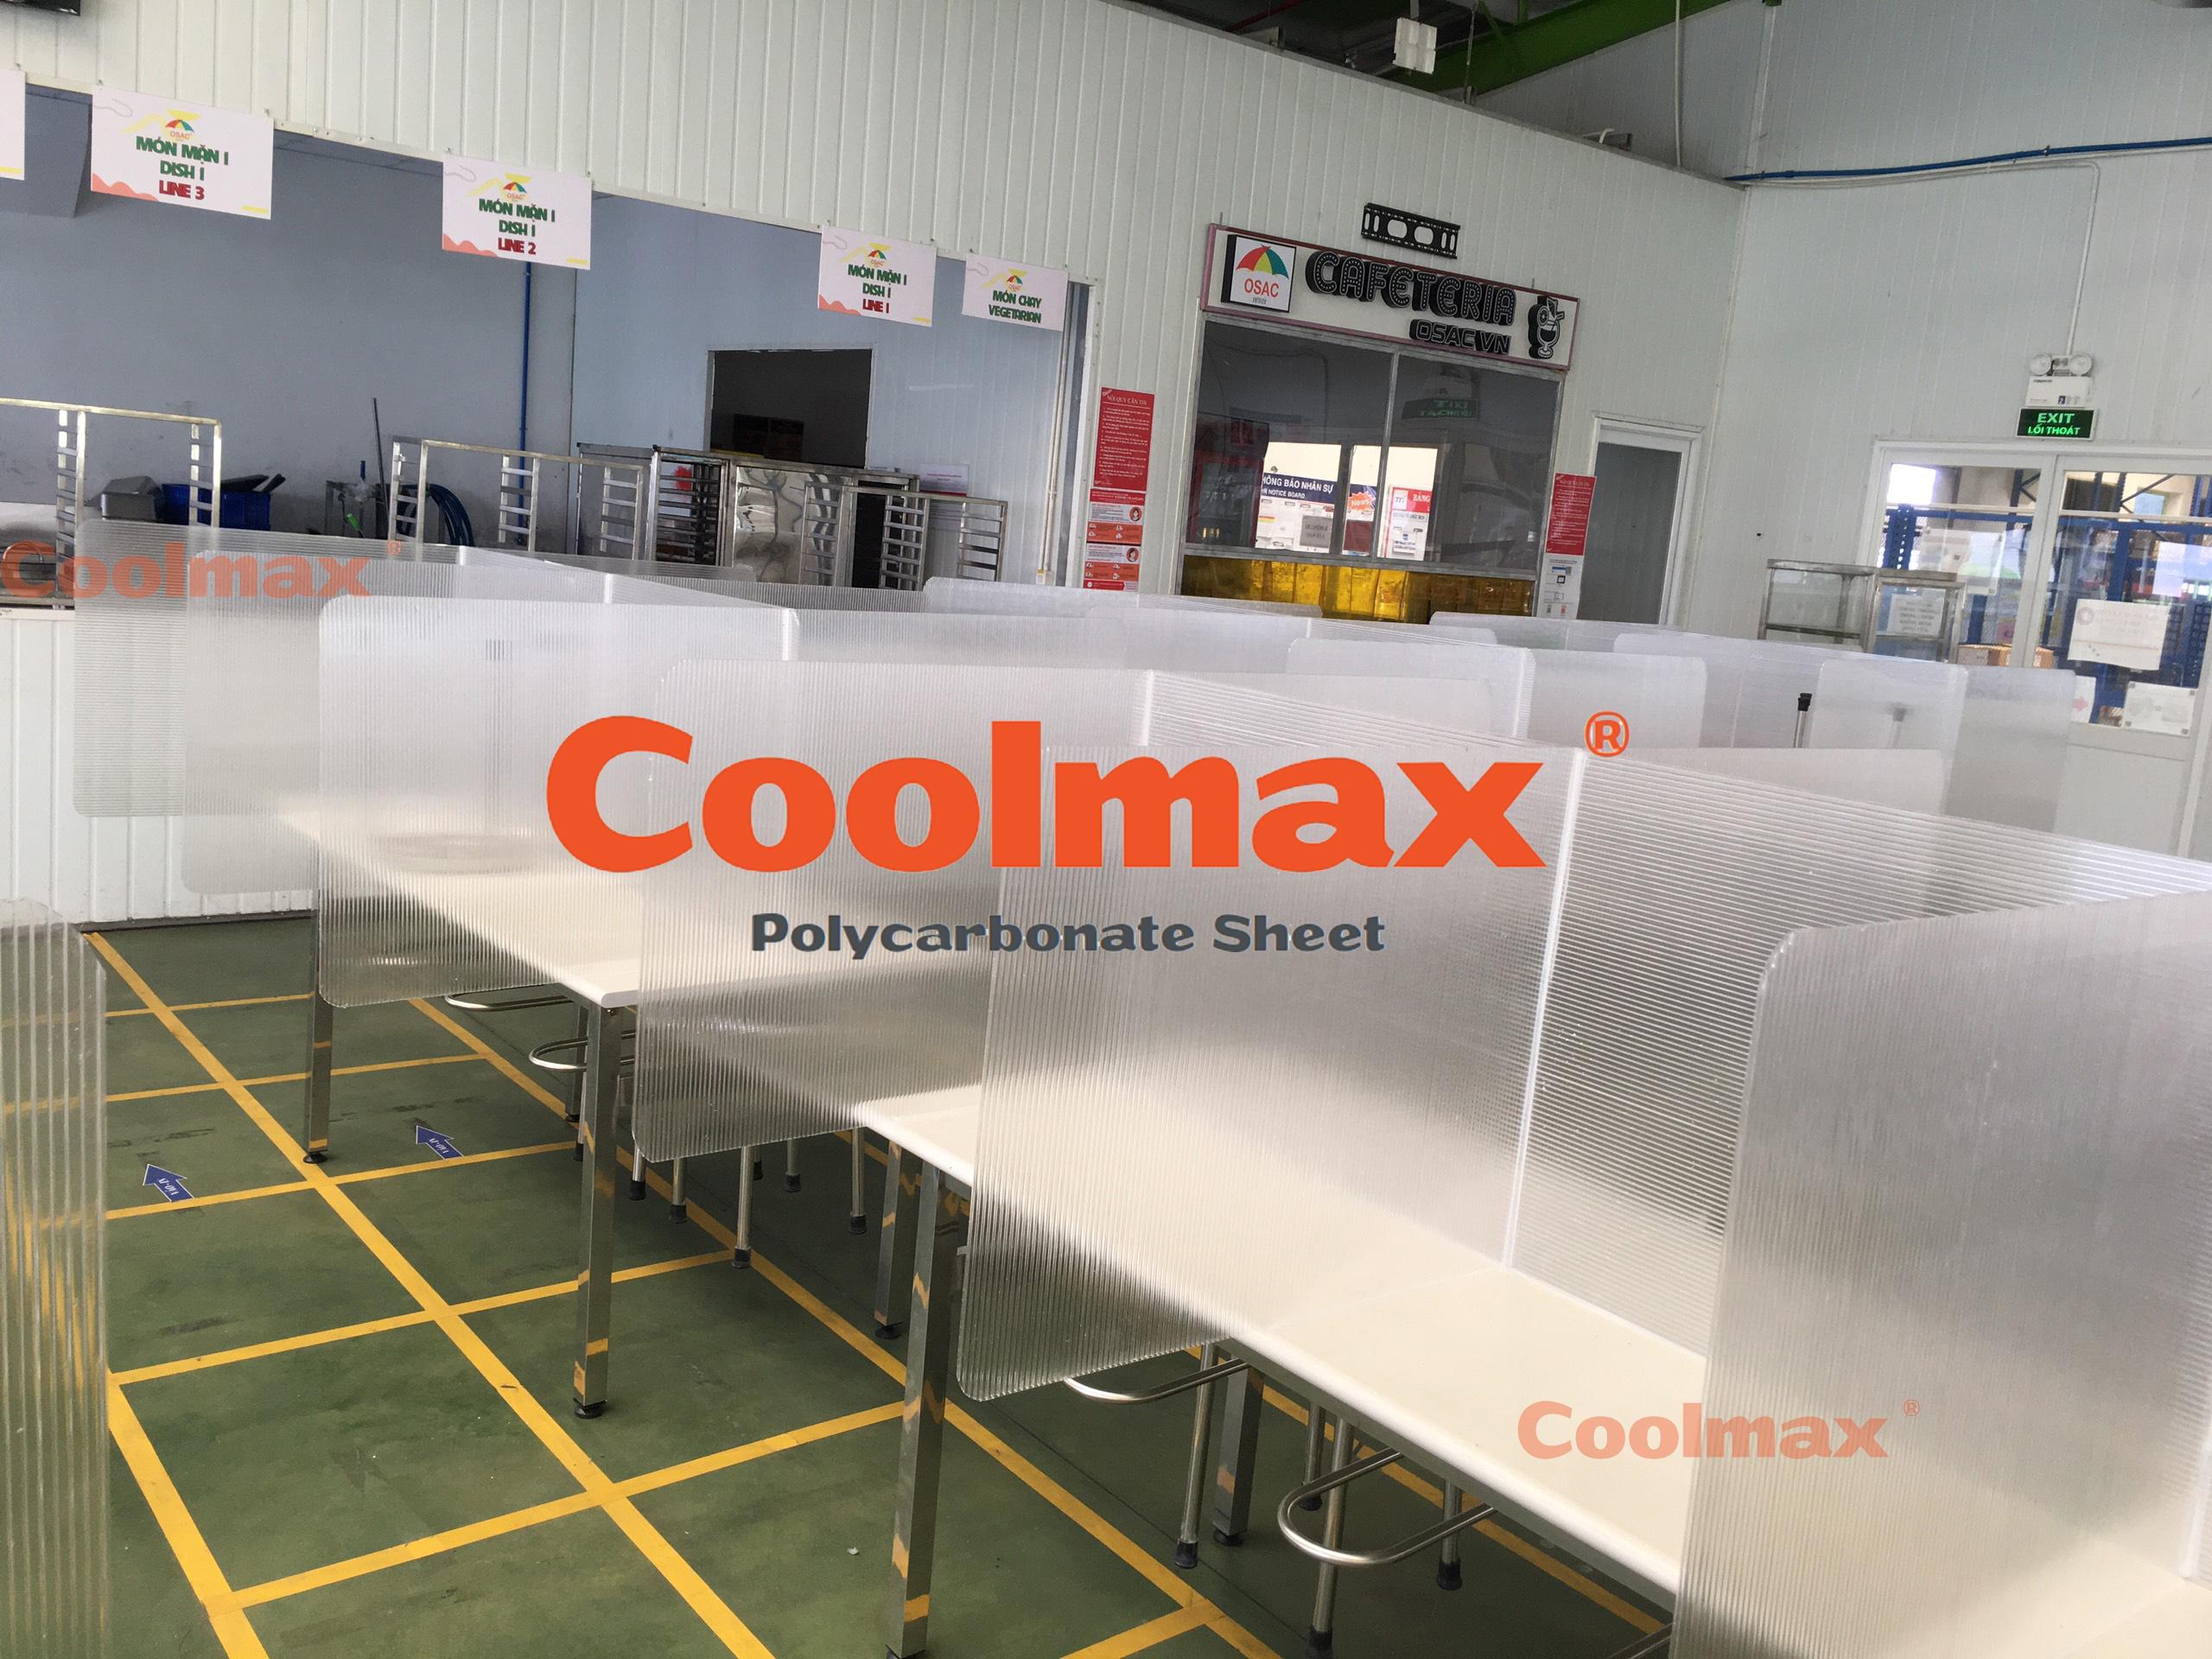 vach ngan giot ban coolmax 1